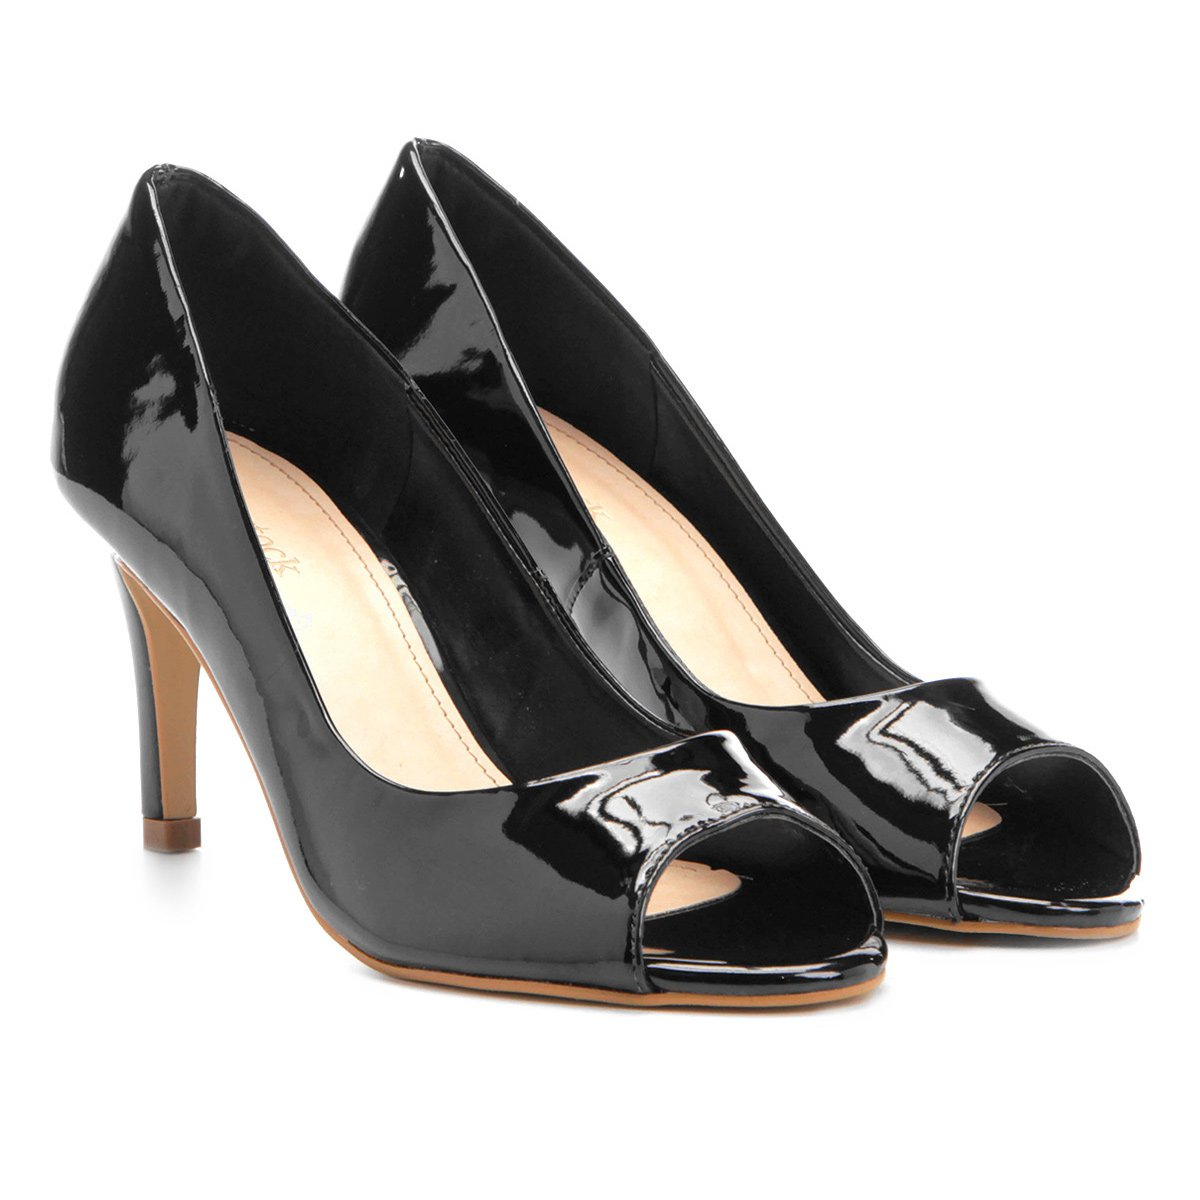 d83830280 Peep Toe Shoestock Salto Fino - Preto - Compre Agora